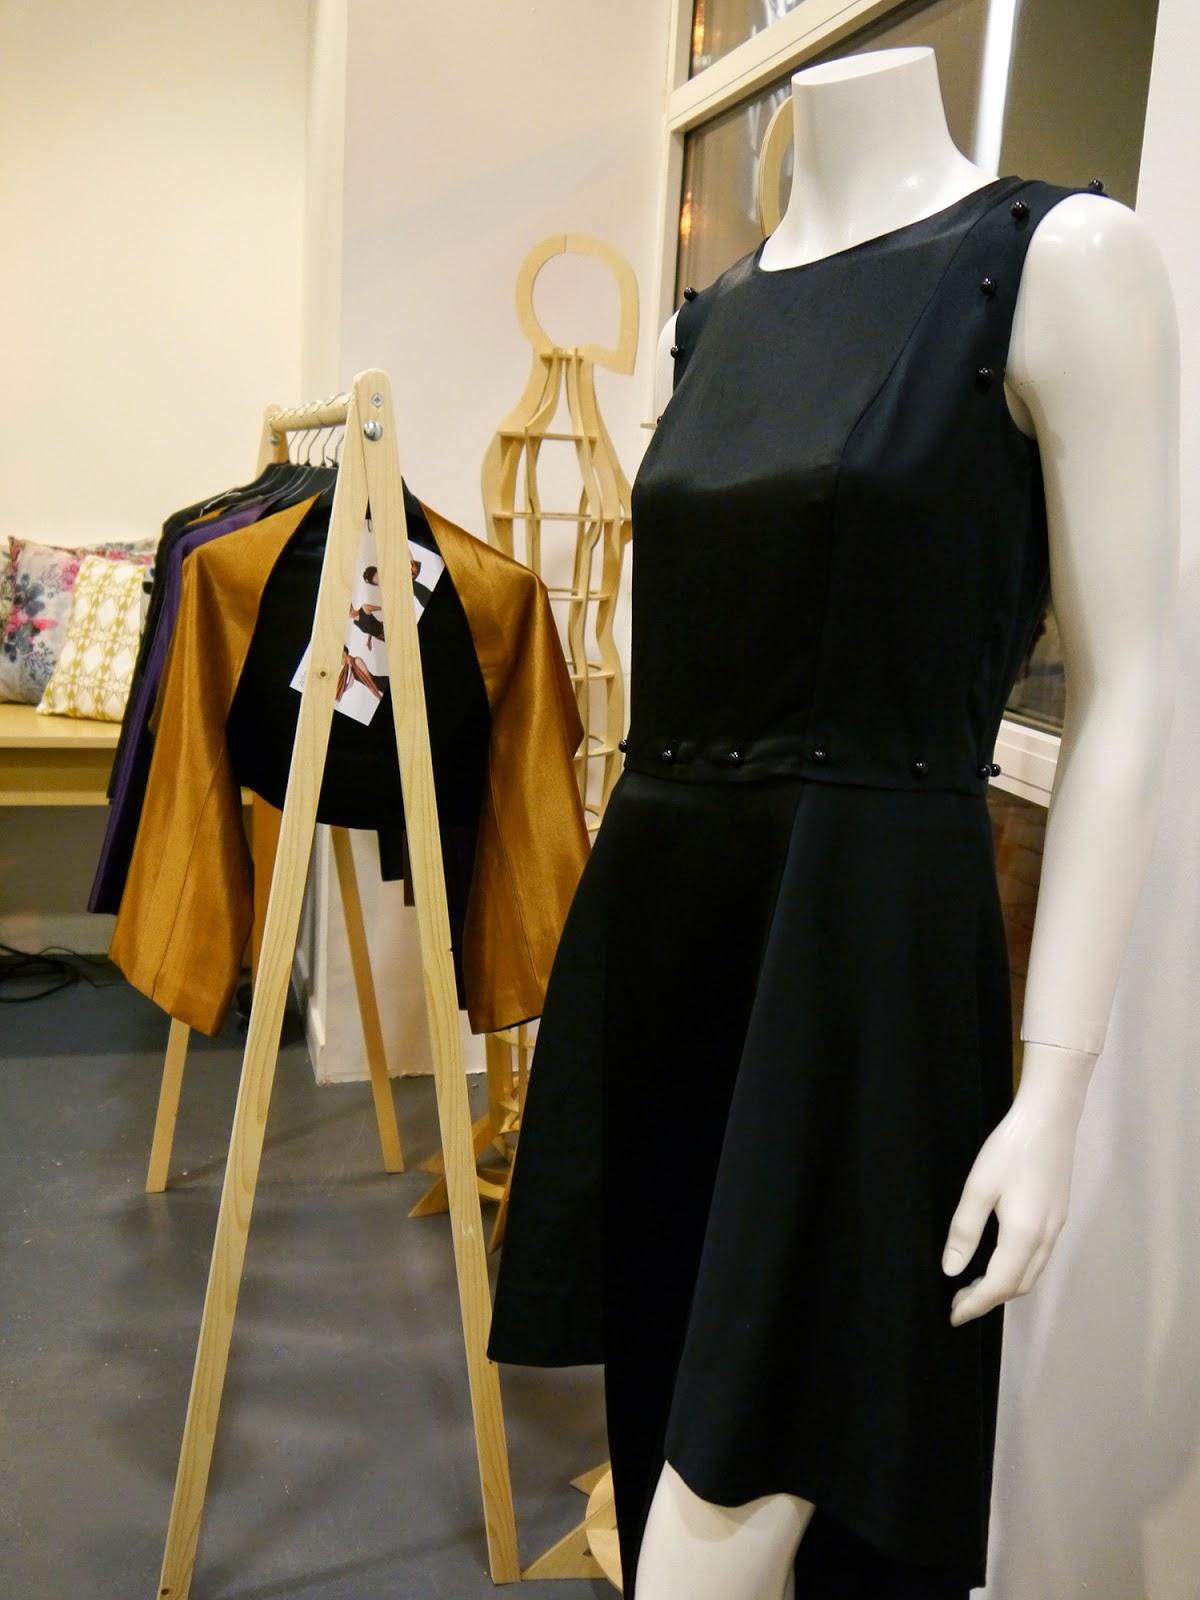 Wear Eponymous, The Wardrobe, Glasgow Fort, Glasgow Pop Up Shop, Shop Display, Scottish Design, Allenomis, womenswear